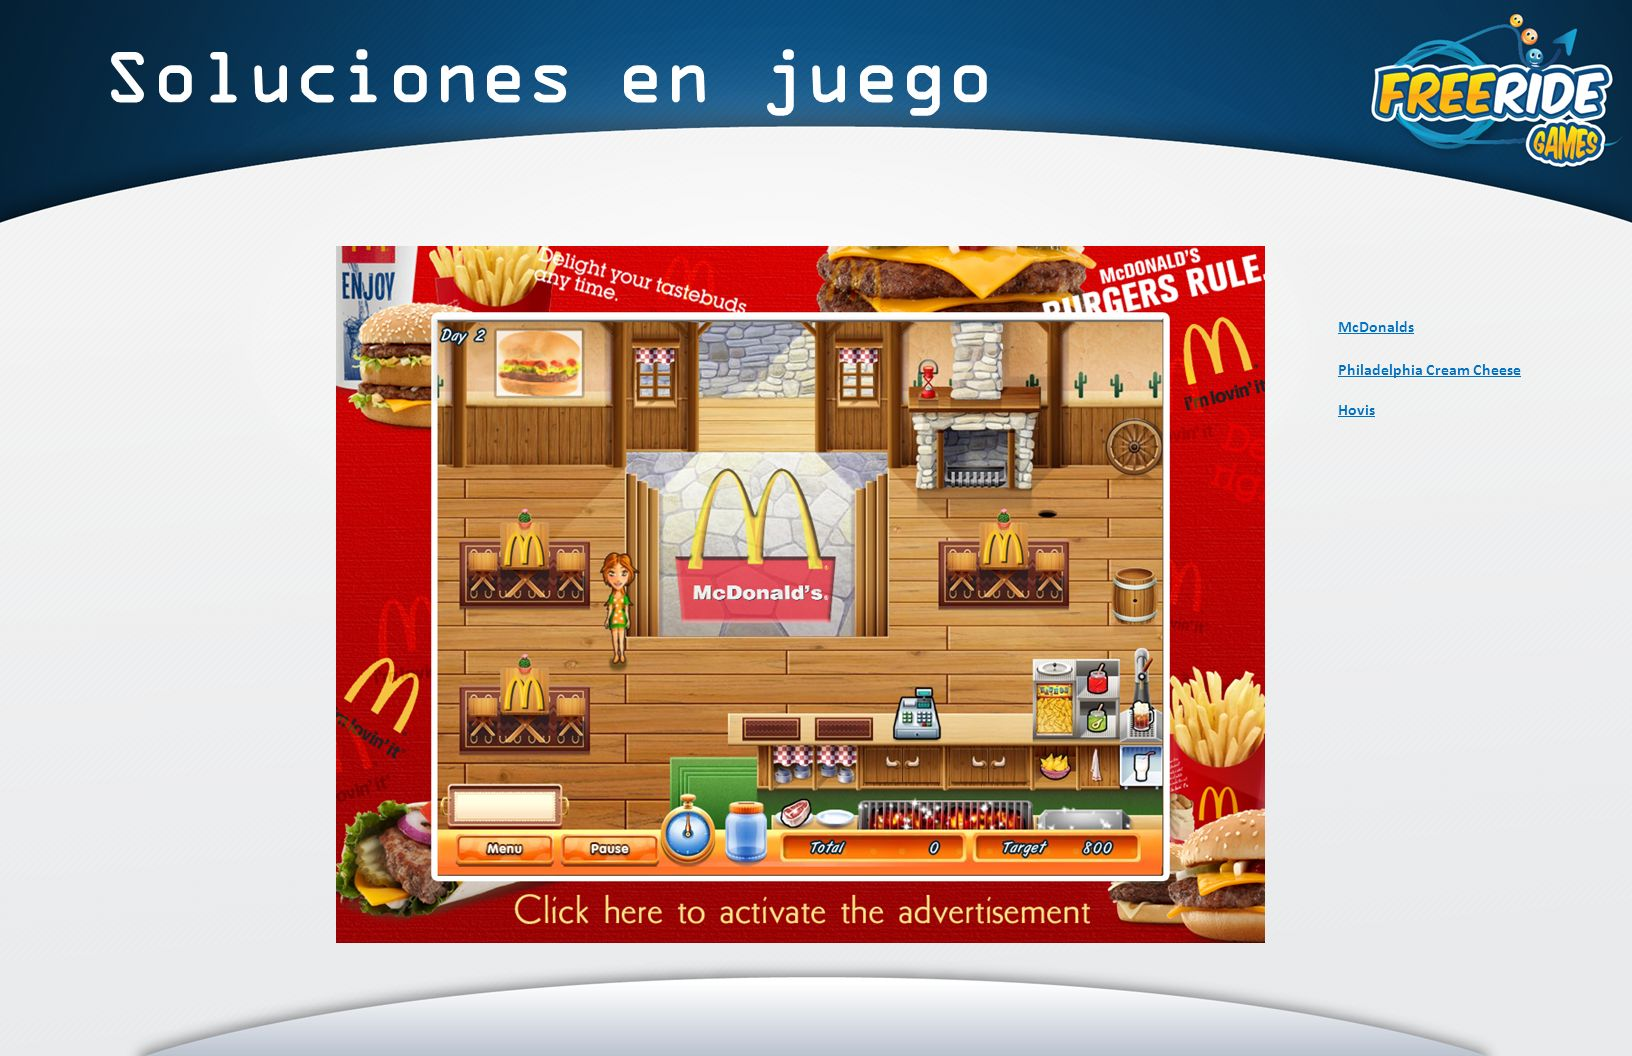 Soluciones en juego McDonalds Philadelphia Cream Cheese Hovis